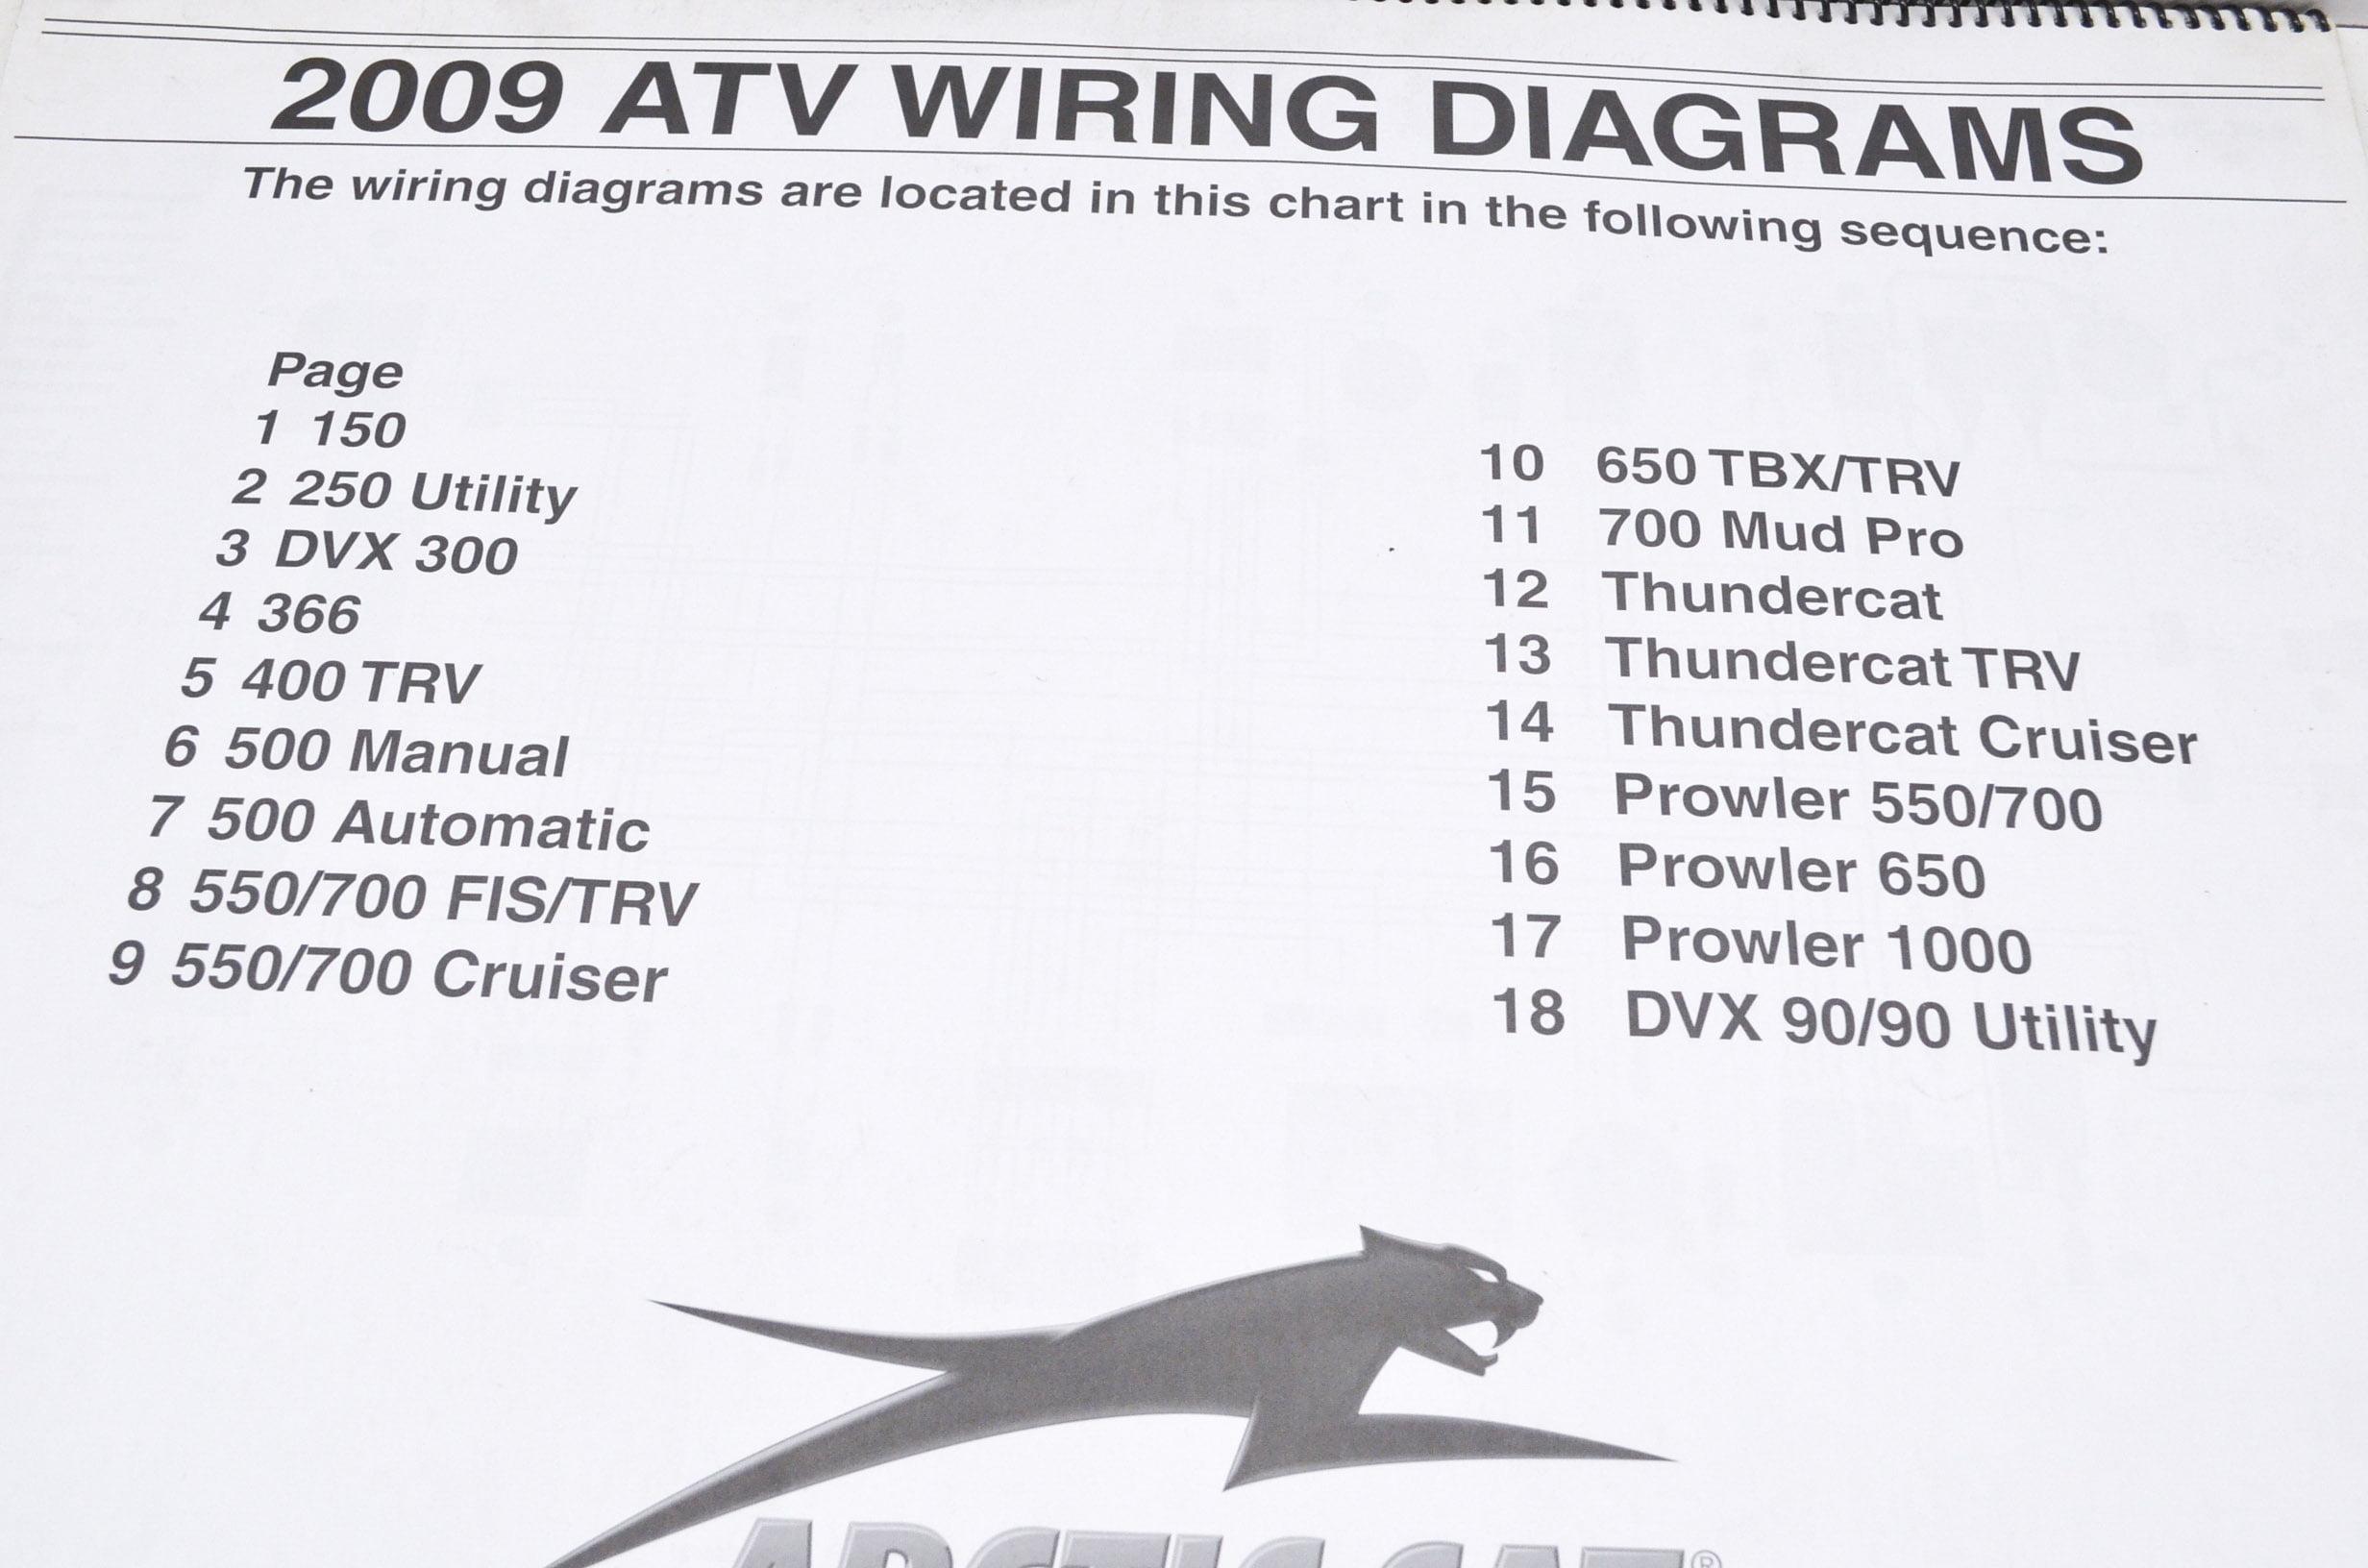 Arctic Cat Prowler 1000 Wiring Diagram Best Electrical Circuit 1990 2258 411 2009 Atv Diagrams Qty 1 Walmart Com Rh 300